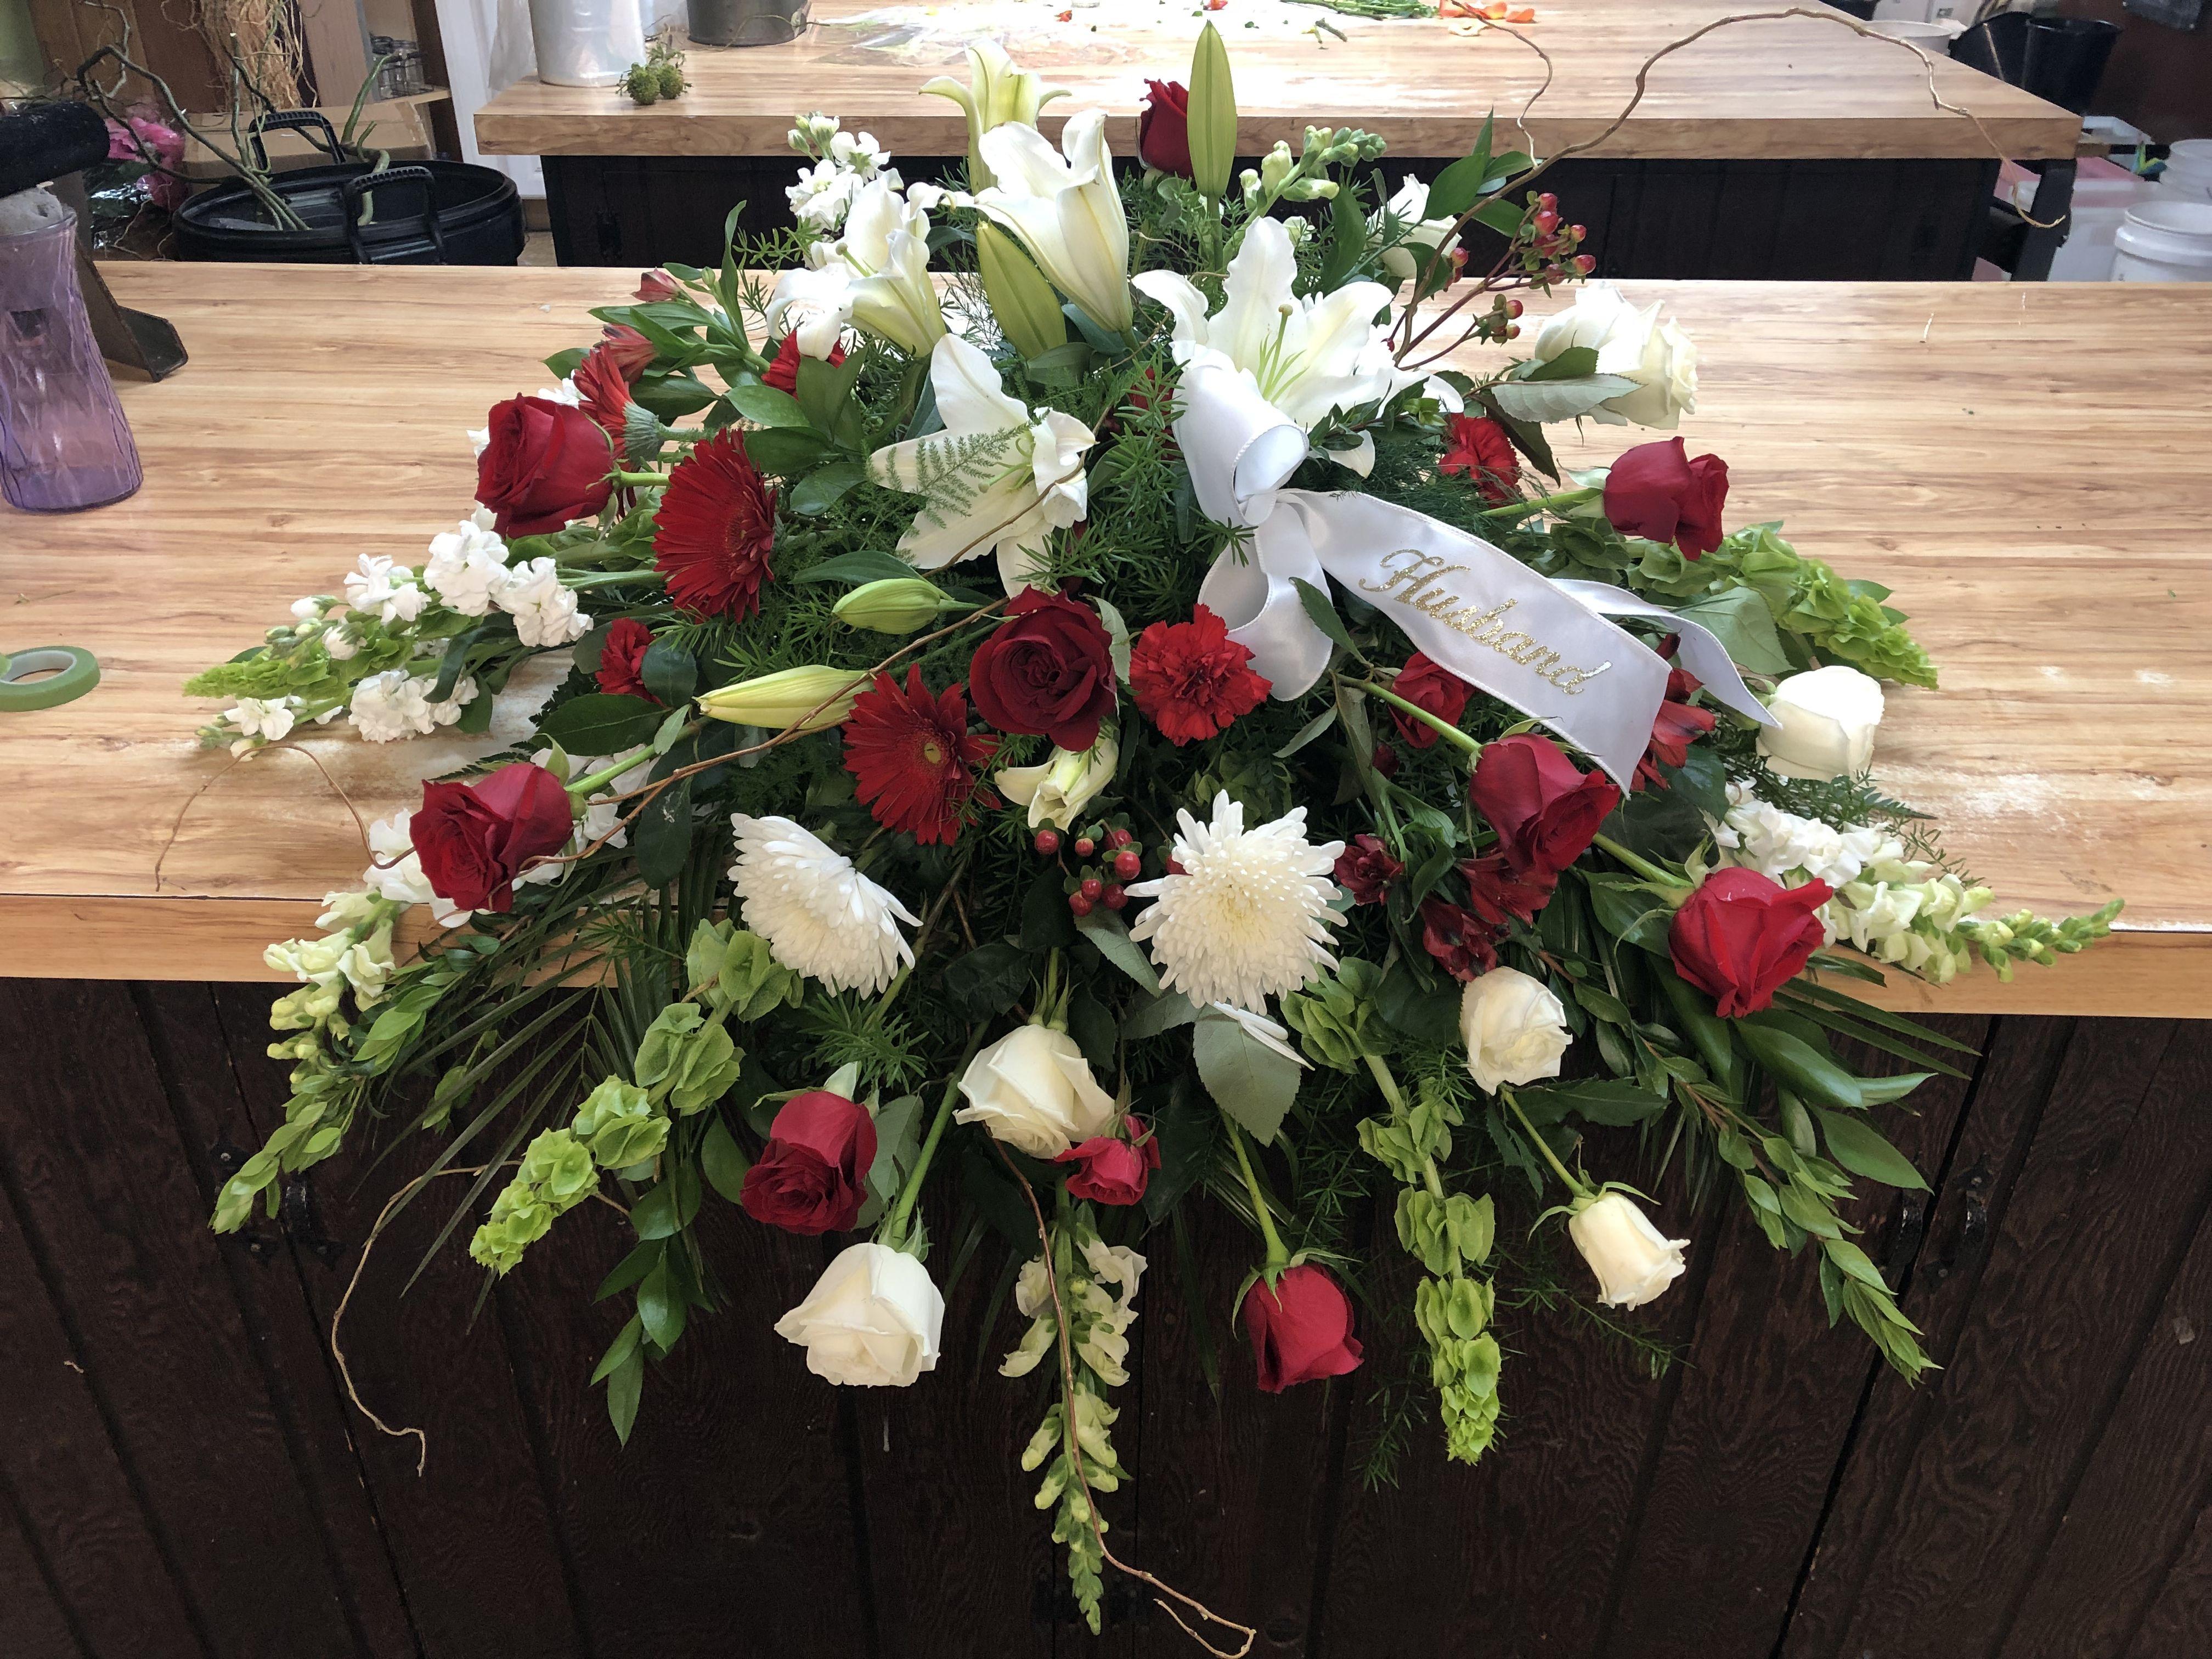 Pin By Twigs Vines Floral On Sympathy Flower Arrangements Funeral Flowers Small Flower Arrangements